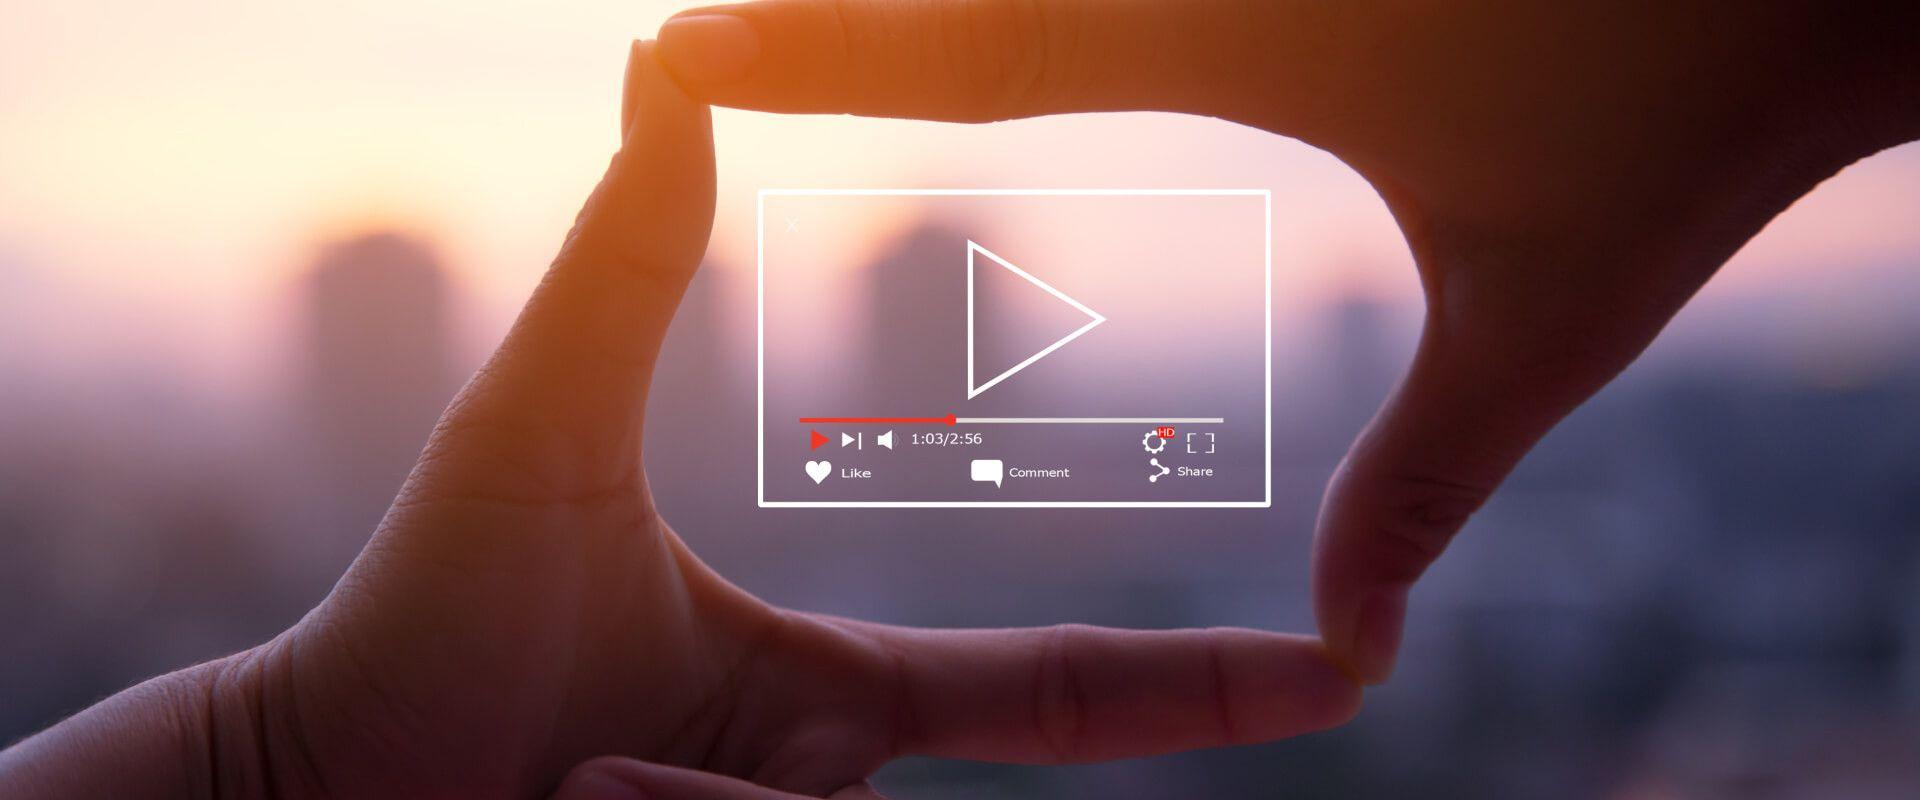 Tendencias del Marketing 2021 - Videomarketing - Marko Bension